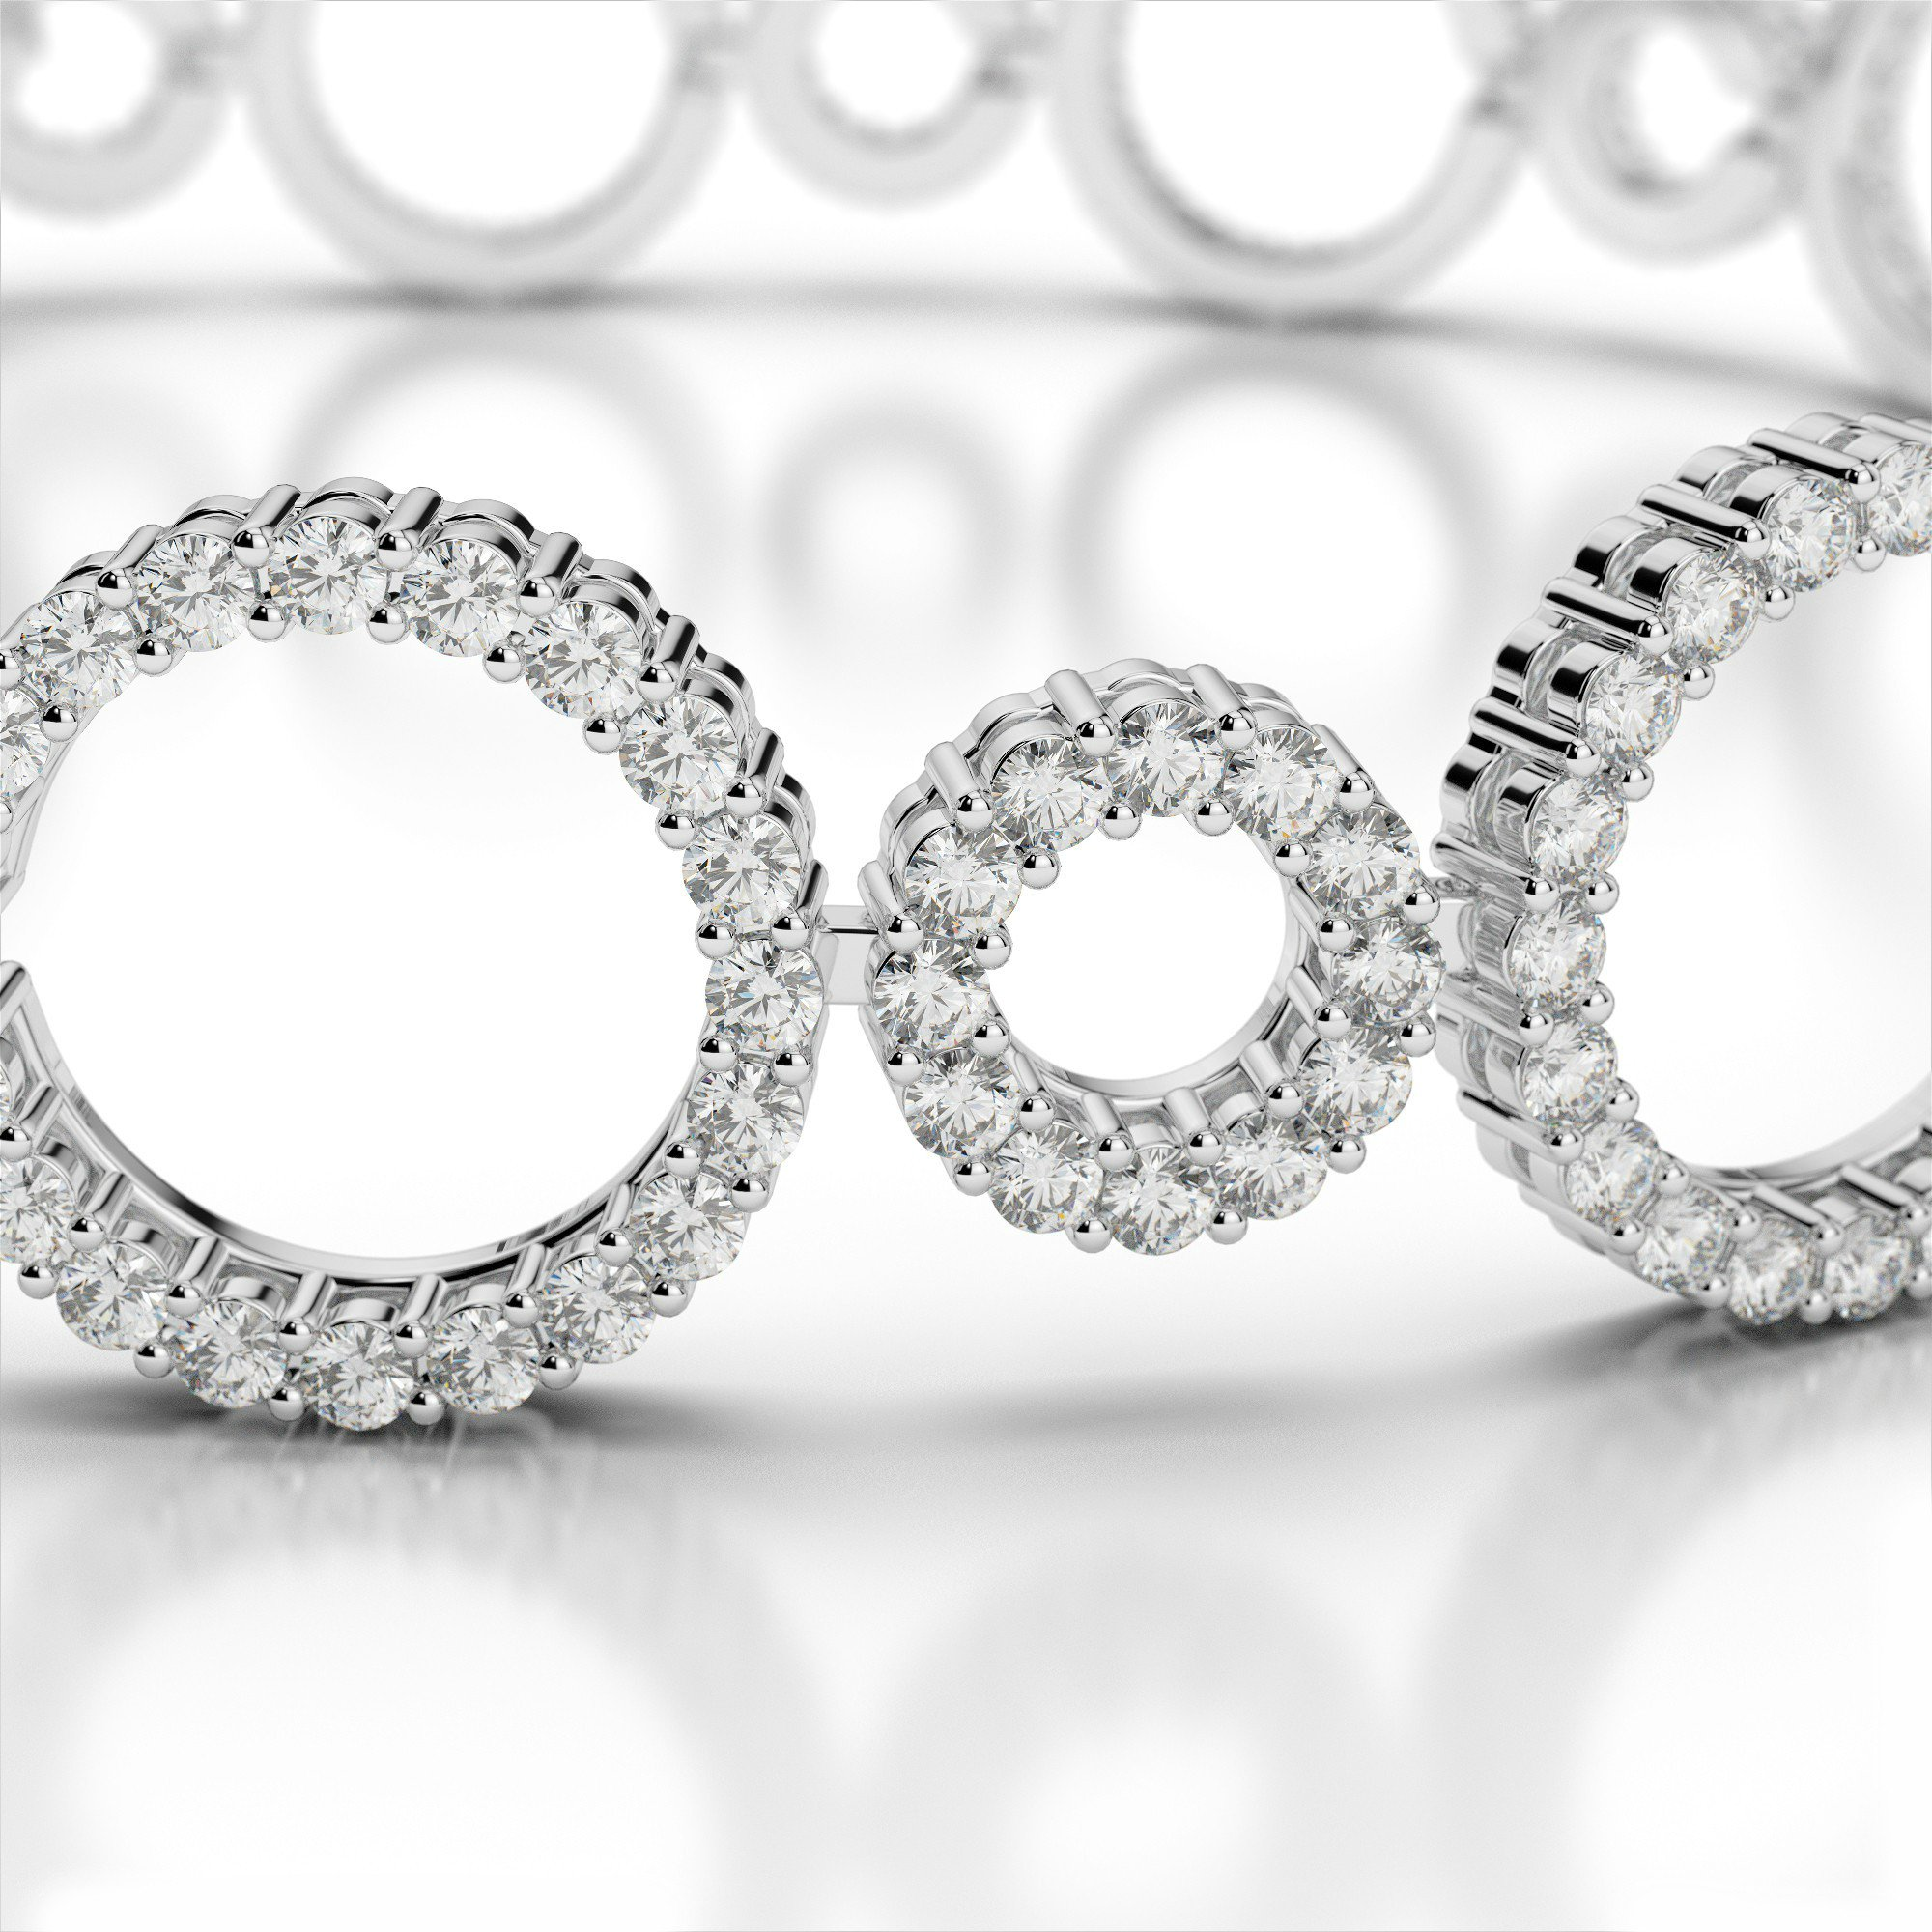 6 Carat Diamond Circle Bracelet